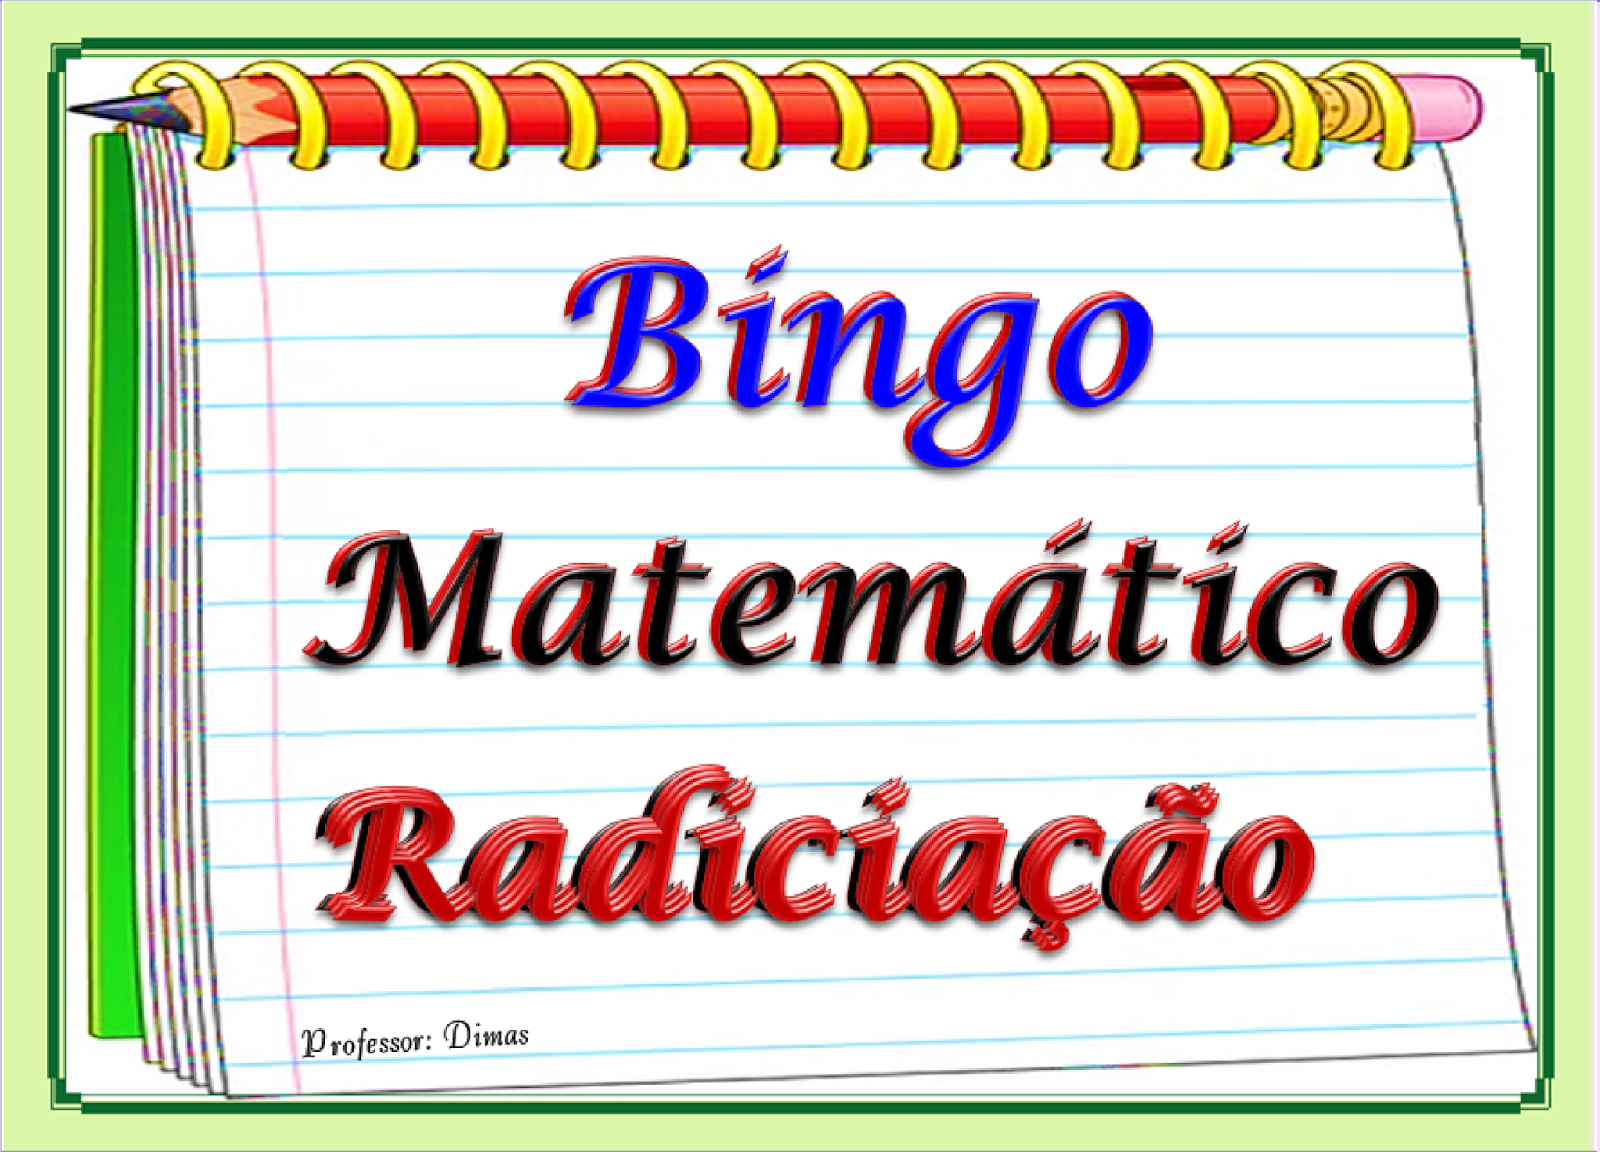 http://pt.slideshare.net/edimarlsantos/bingo-matemticoradiciao